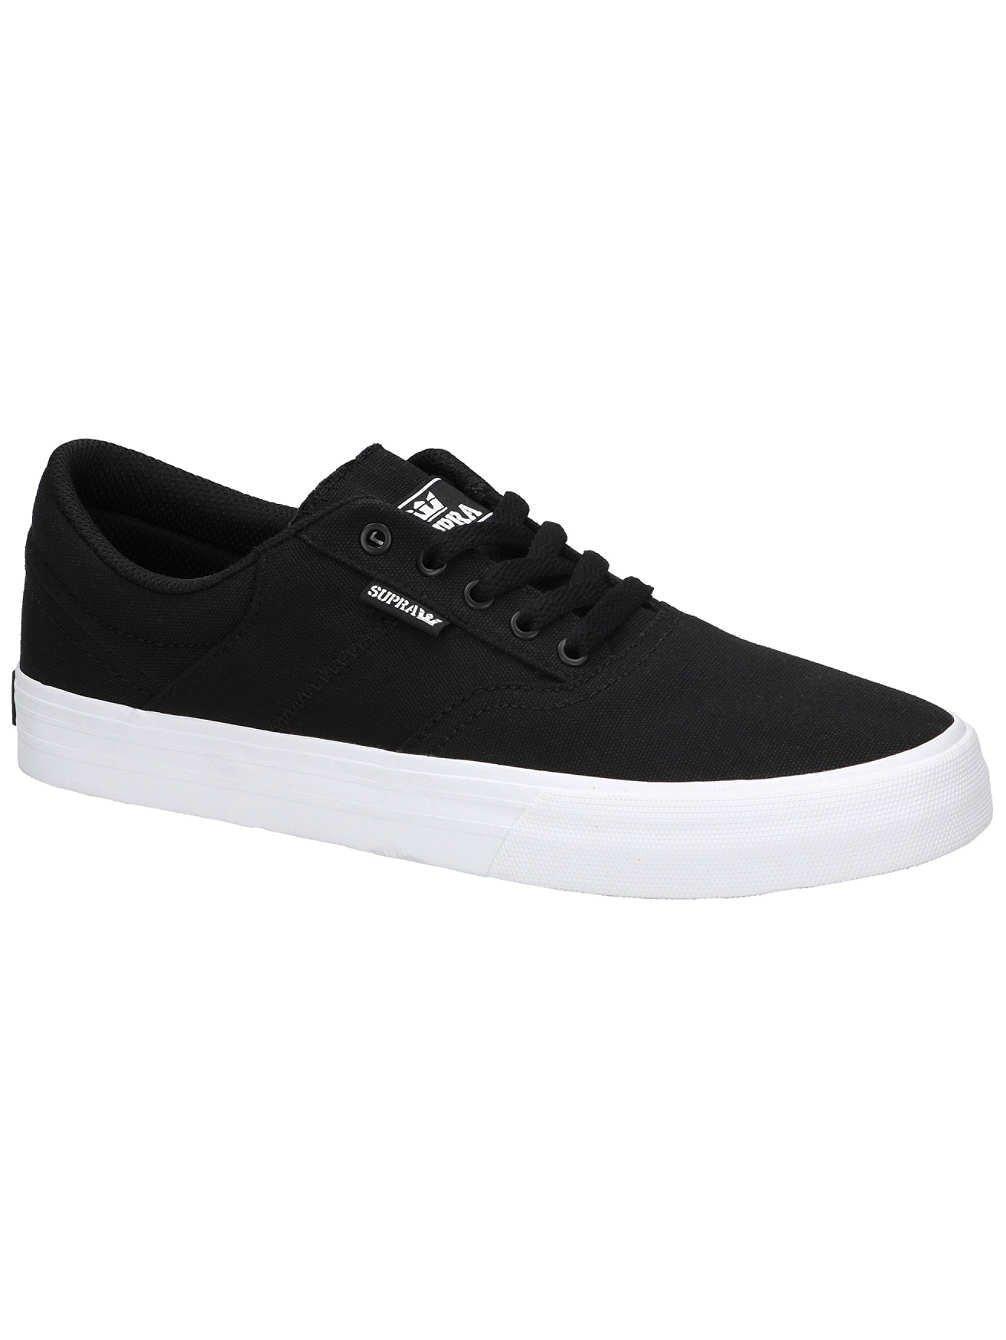 Supra Hombres Calzado/Zapatillas de Deporte Cobalt 44 EU Negro